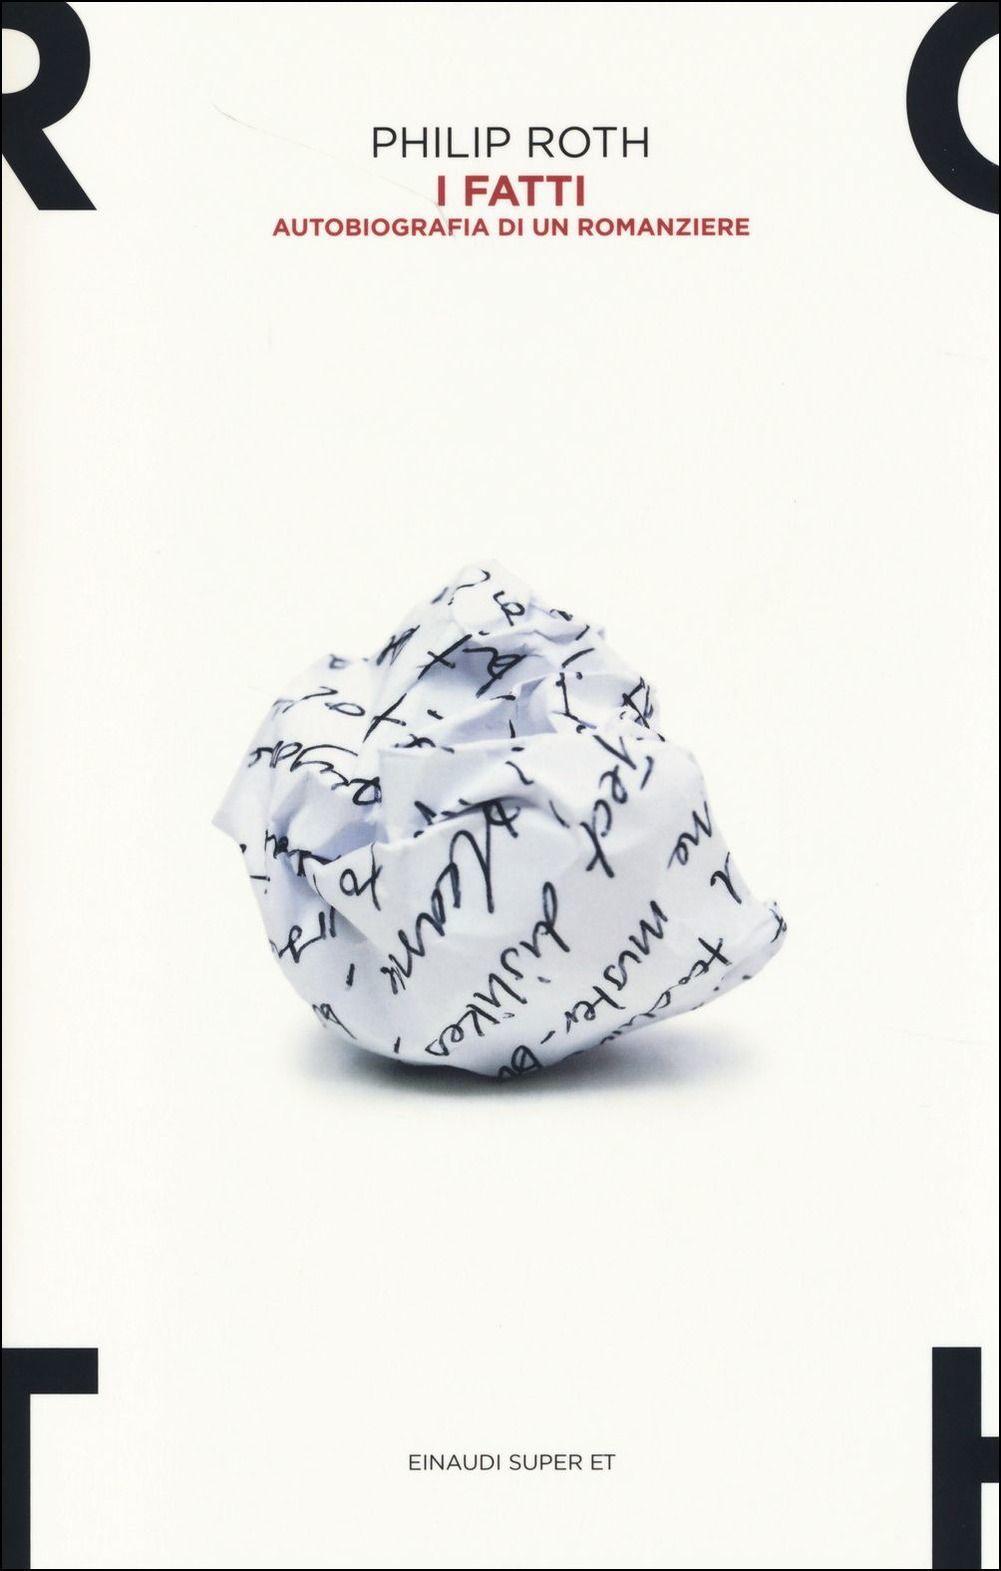 tra le donne single 1991 poesie annunci incontri toscana